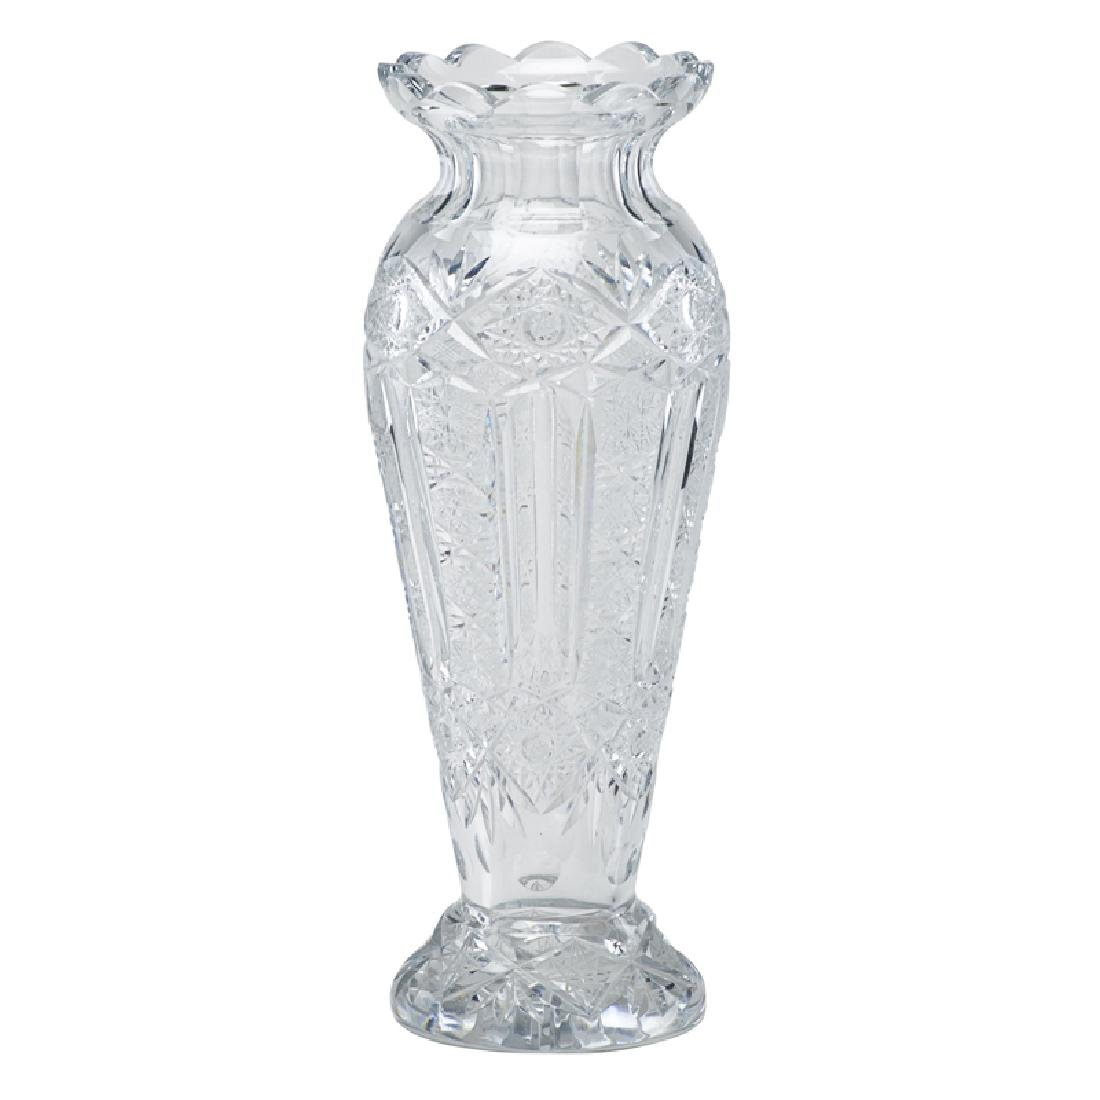 MONUMENTAL CUT GLASS VASE